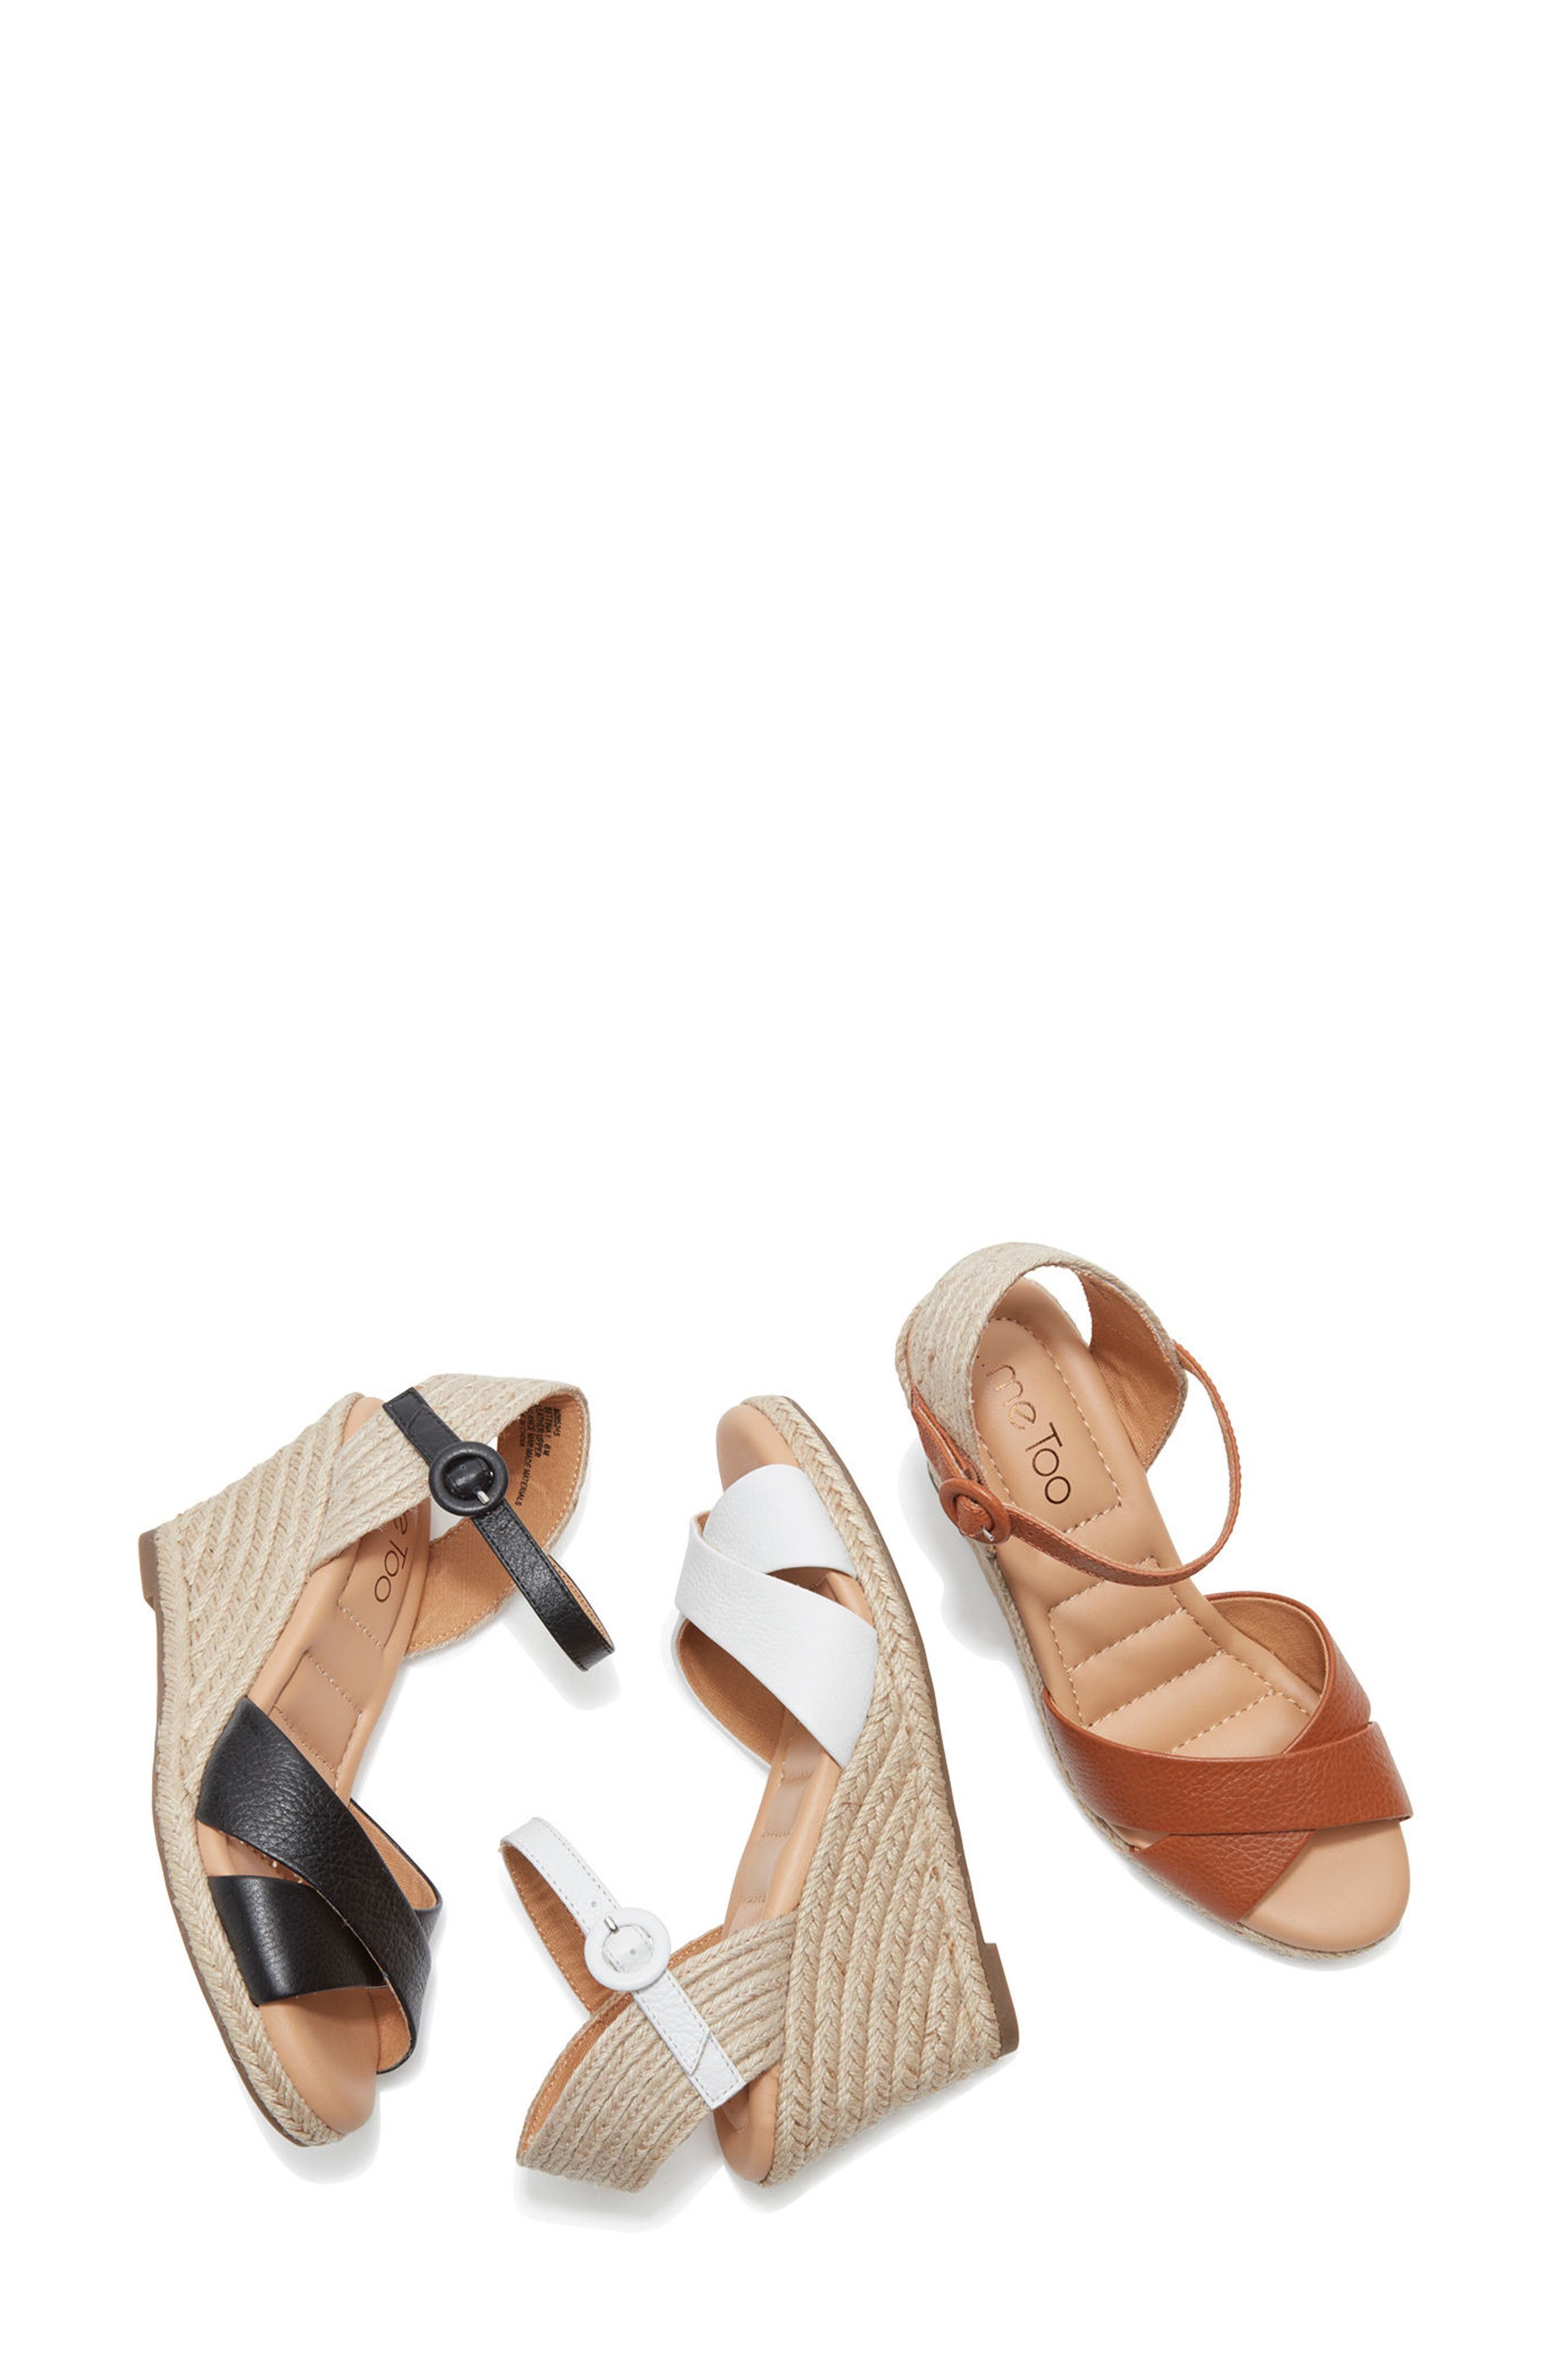 Bettina Espadrille Wedge Sandal,                             Alternate thumbnail 8, color,                             010